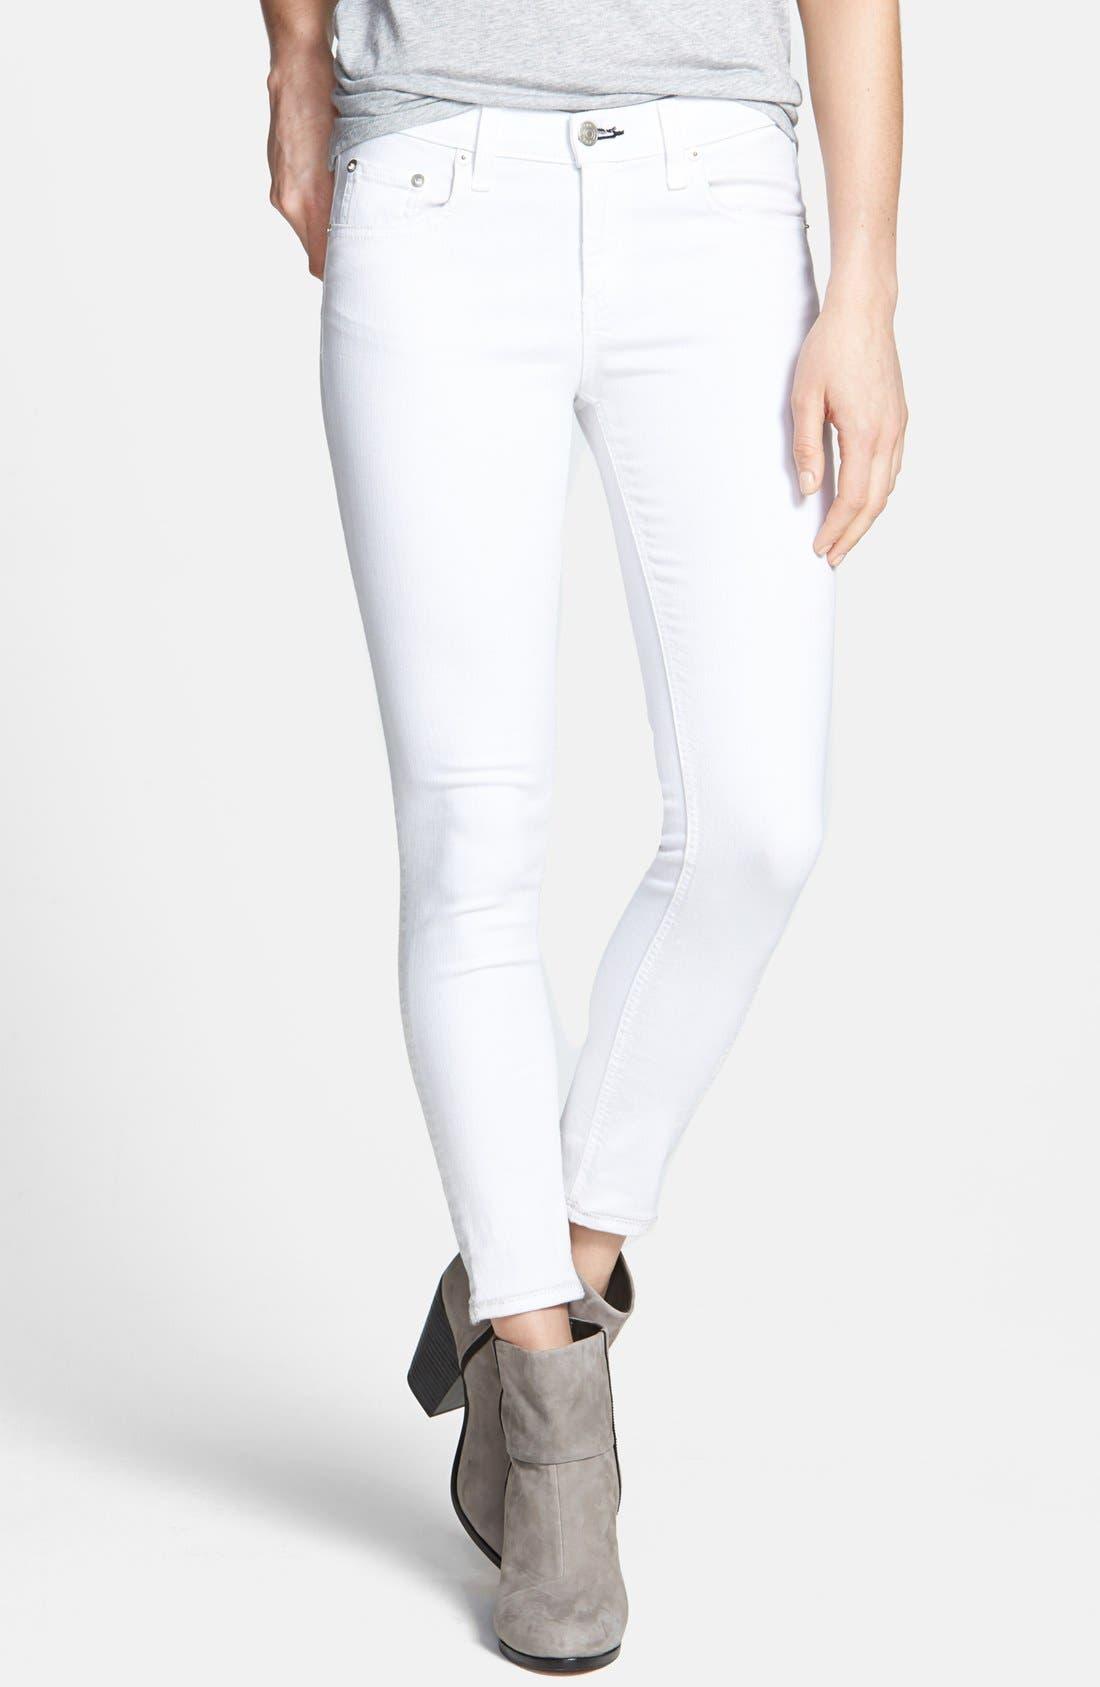 Alternate Image 1 Selected - rag & bone/JEAN 'The Skinny' Crop Jeans (Bright White)